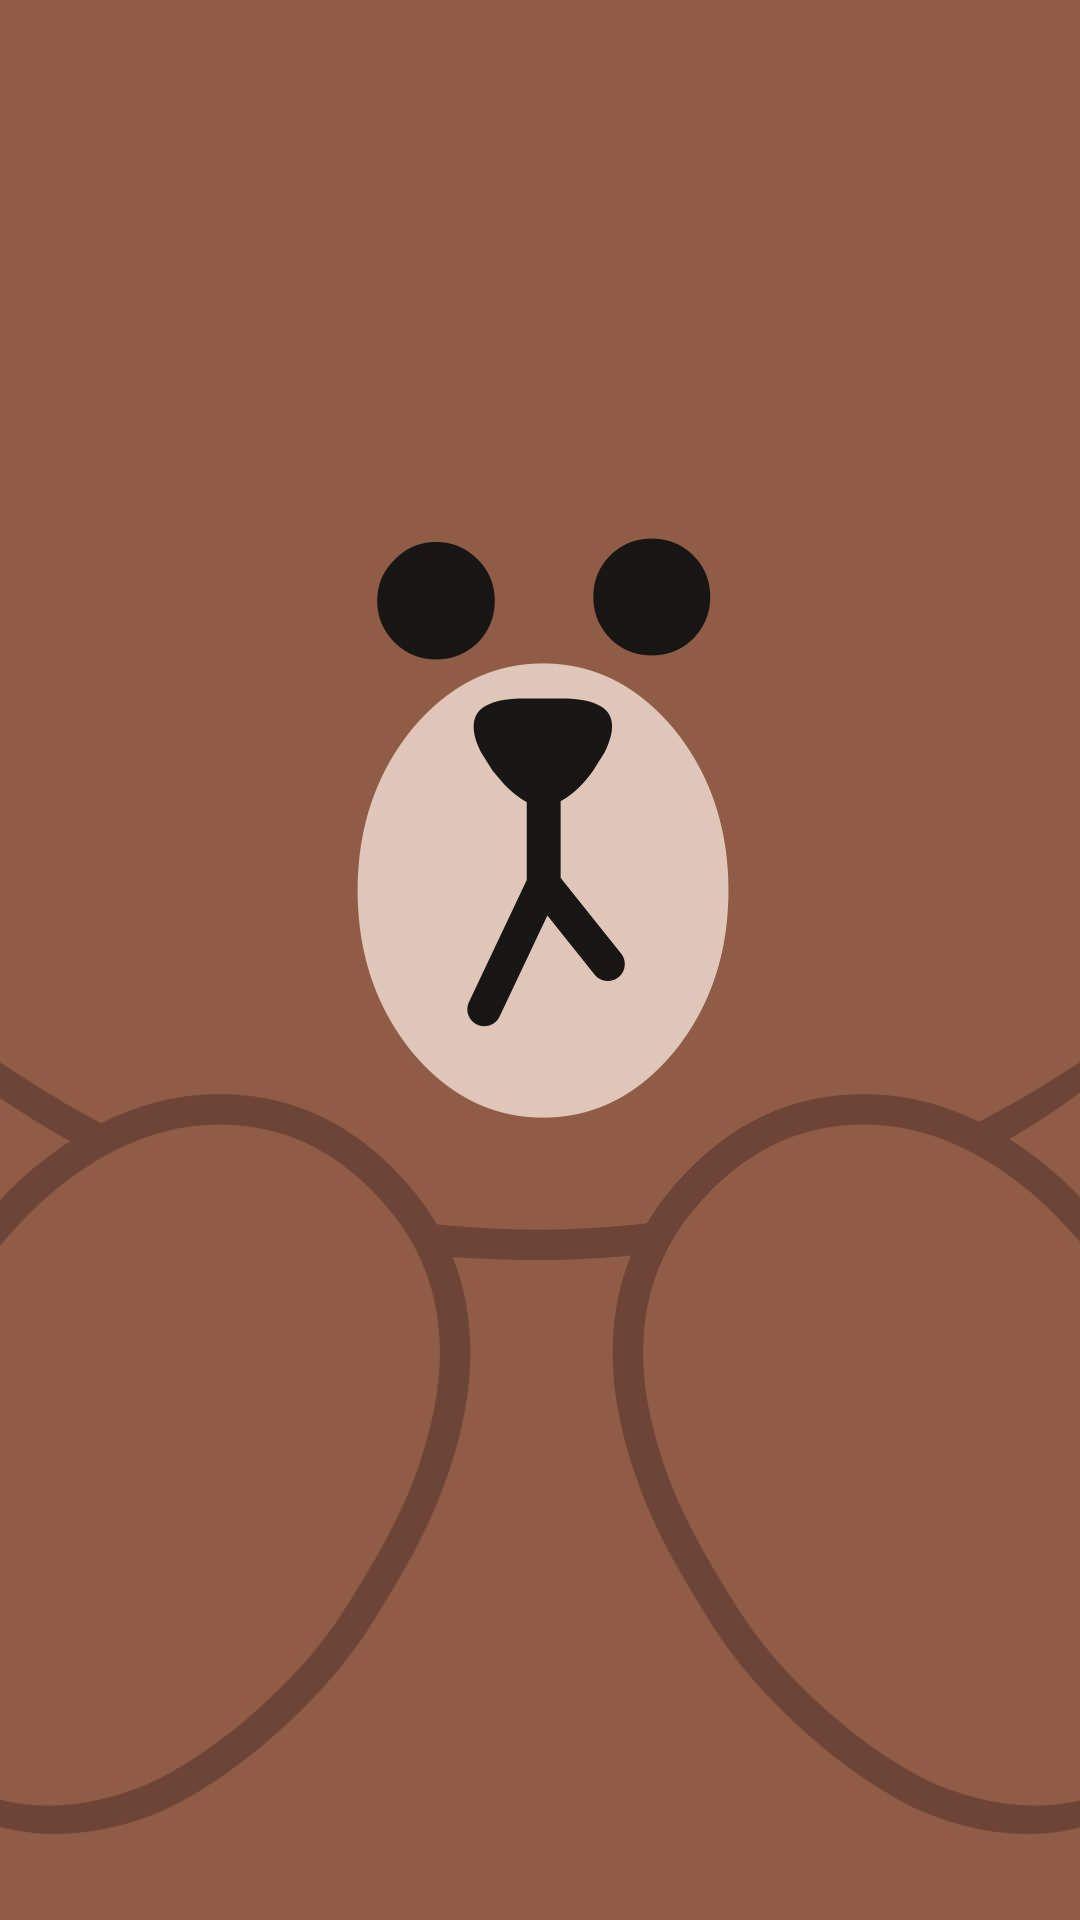 Bear Cartoon Wallpapers Top Free Bear Cartoon Backgrounds Wallpaperaccess